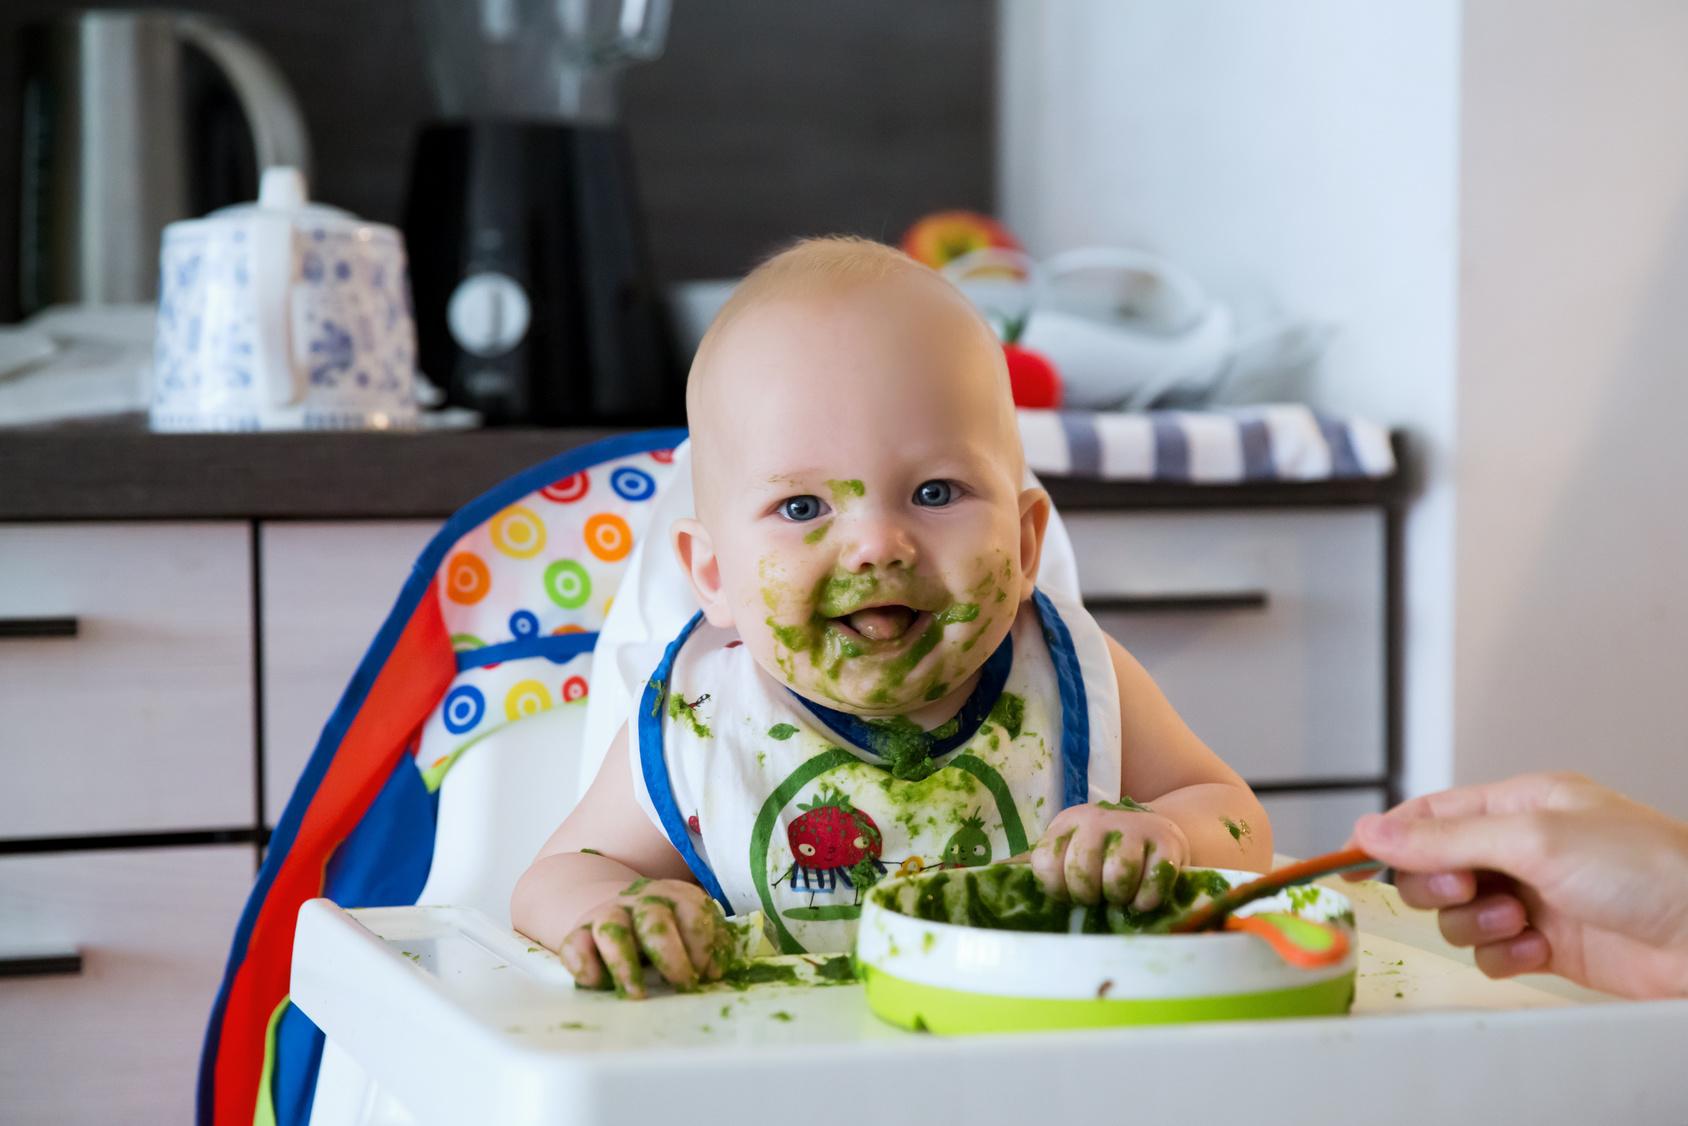 Pranzo Per Bambini Di 10 Mesi : Ricette svezzamento mesi bambino elenco cibi bimbisani e